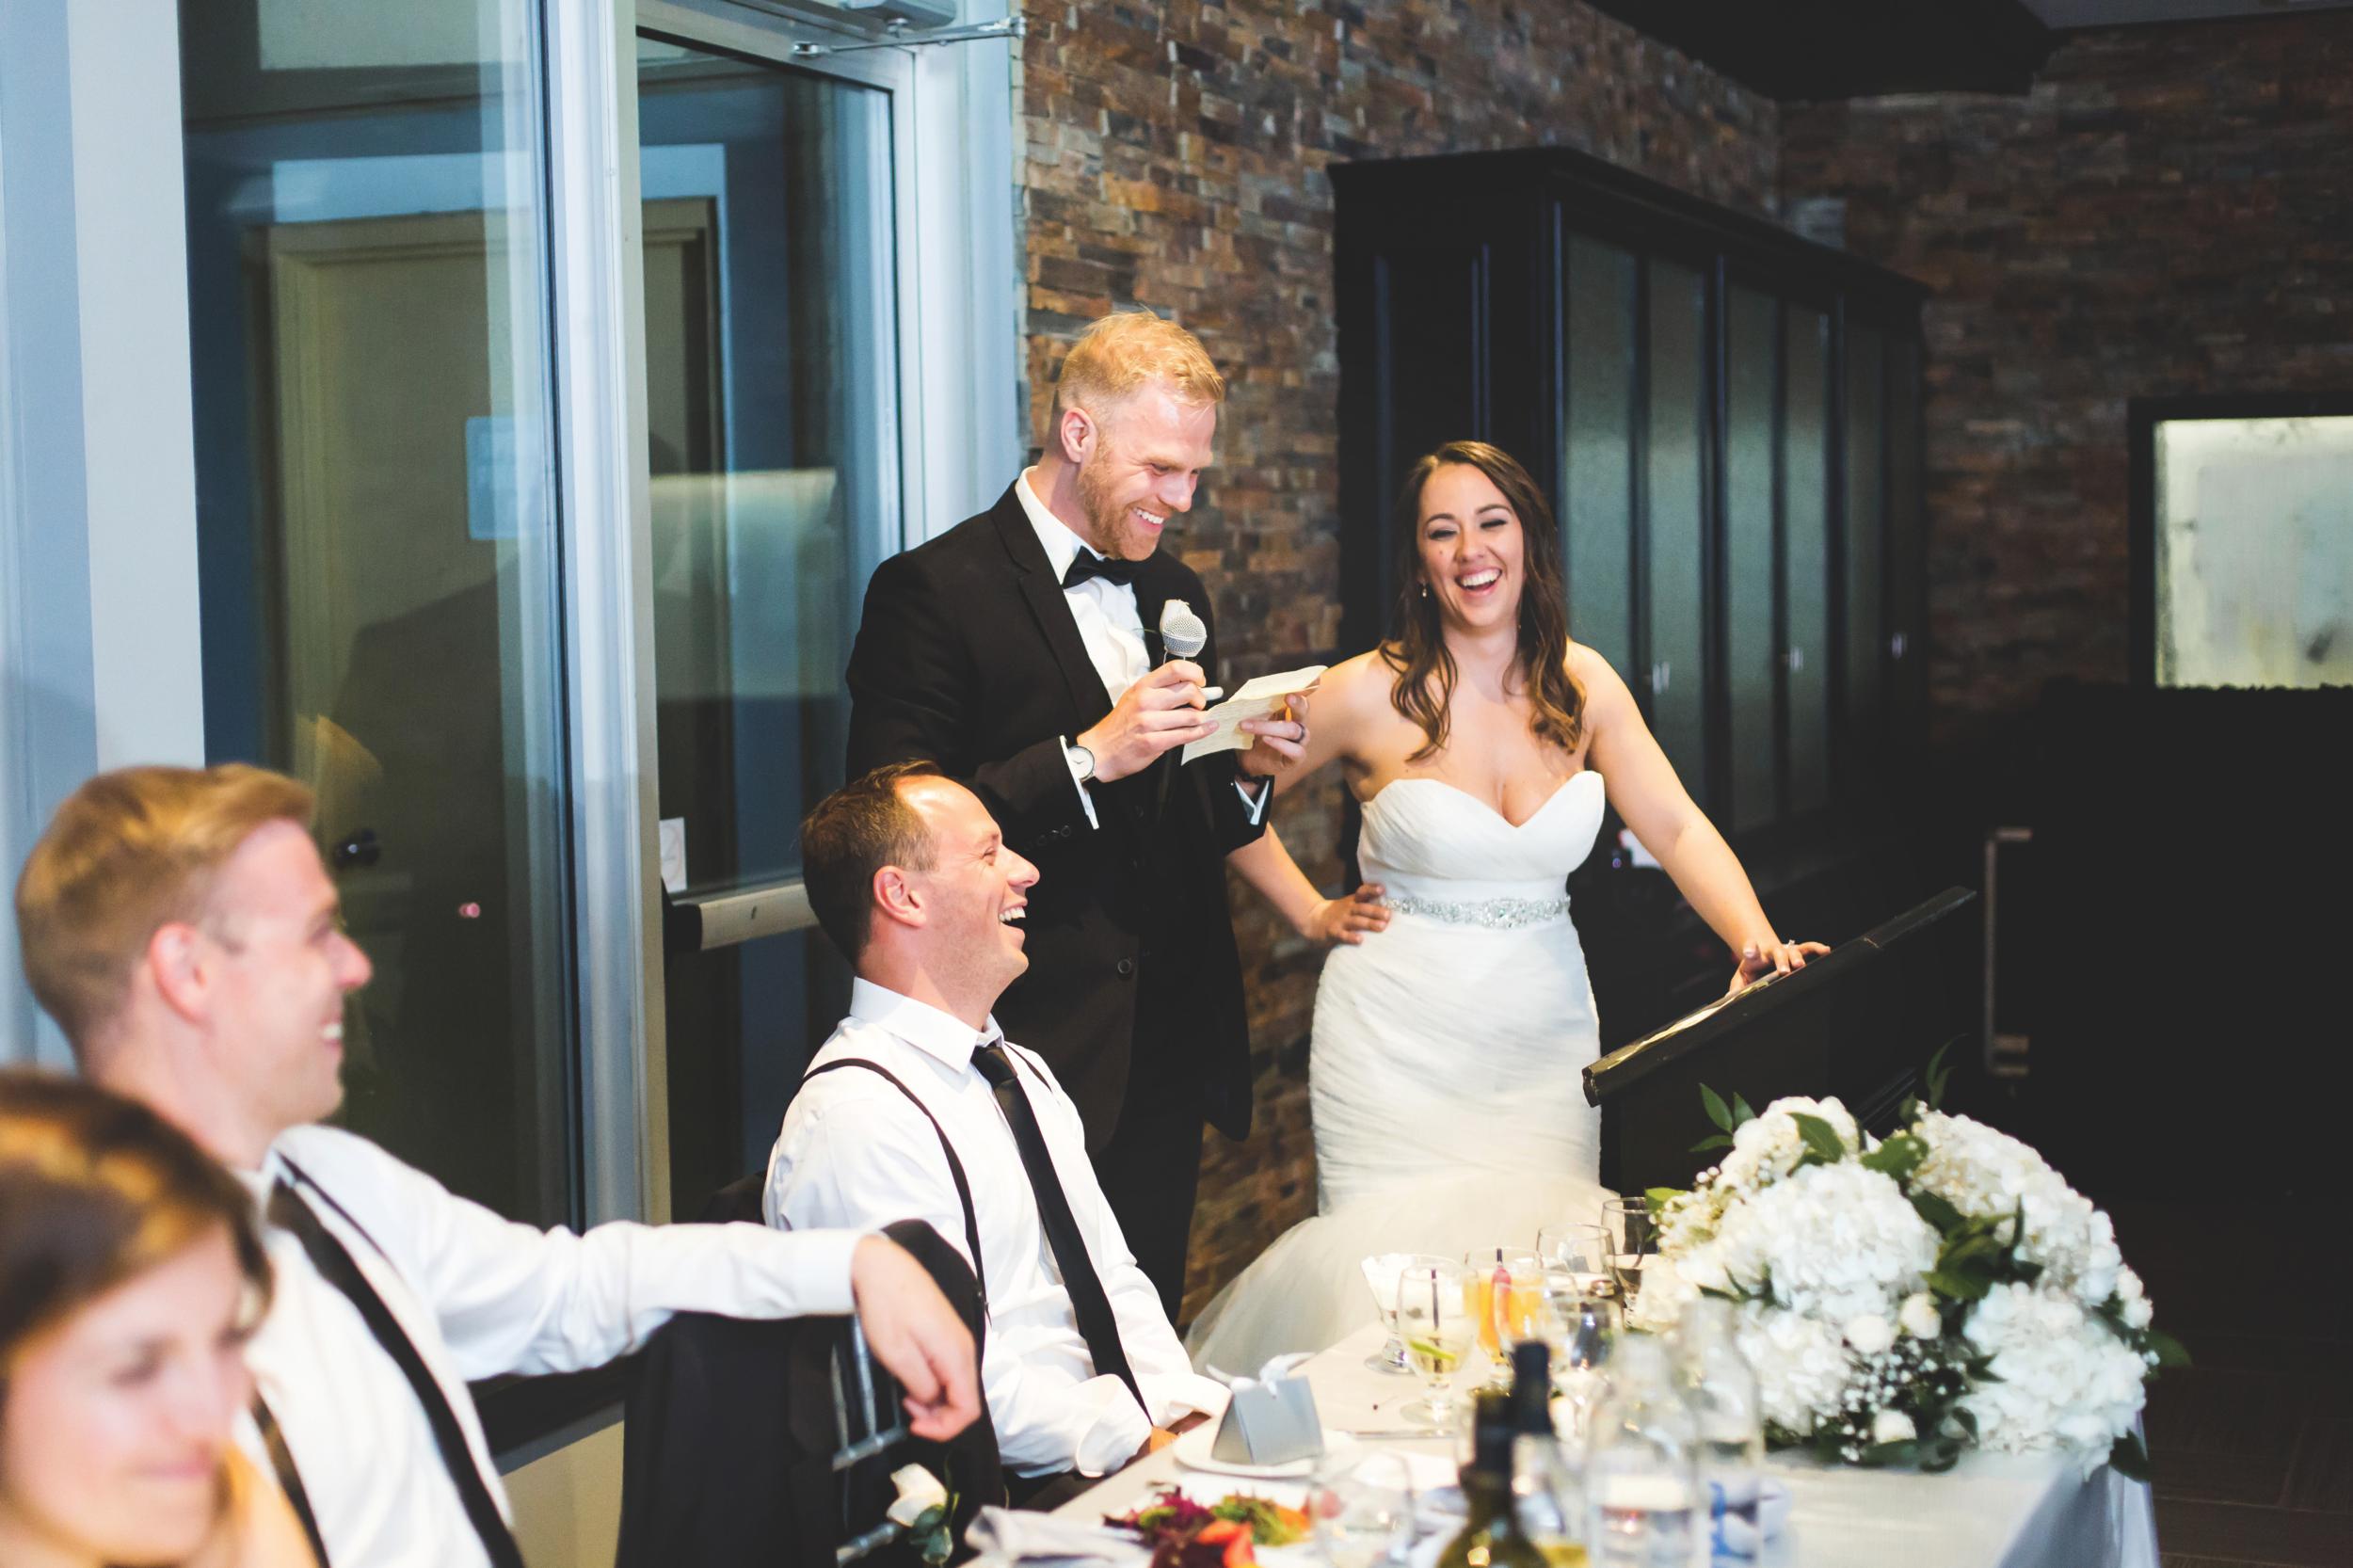 Wedding-Harbour-Banquet-Center-Oakville-Photographer-Wedding-Hamilton-Saint-James-Espresso-Downtown-HamOnt-GTA-Niagara-Toronto-Moments-by-Lauren-Photography-Photo-Image-80.png